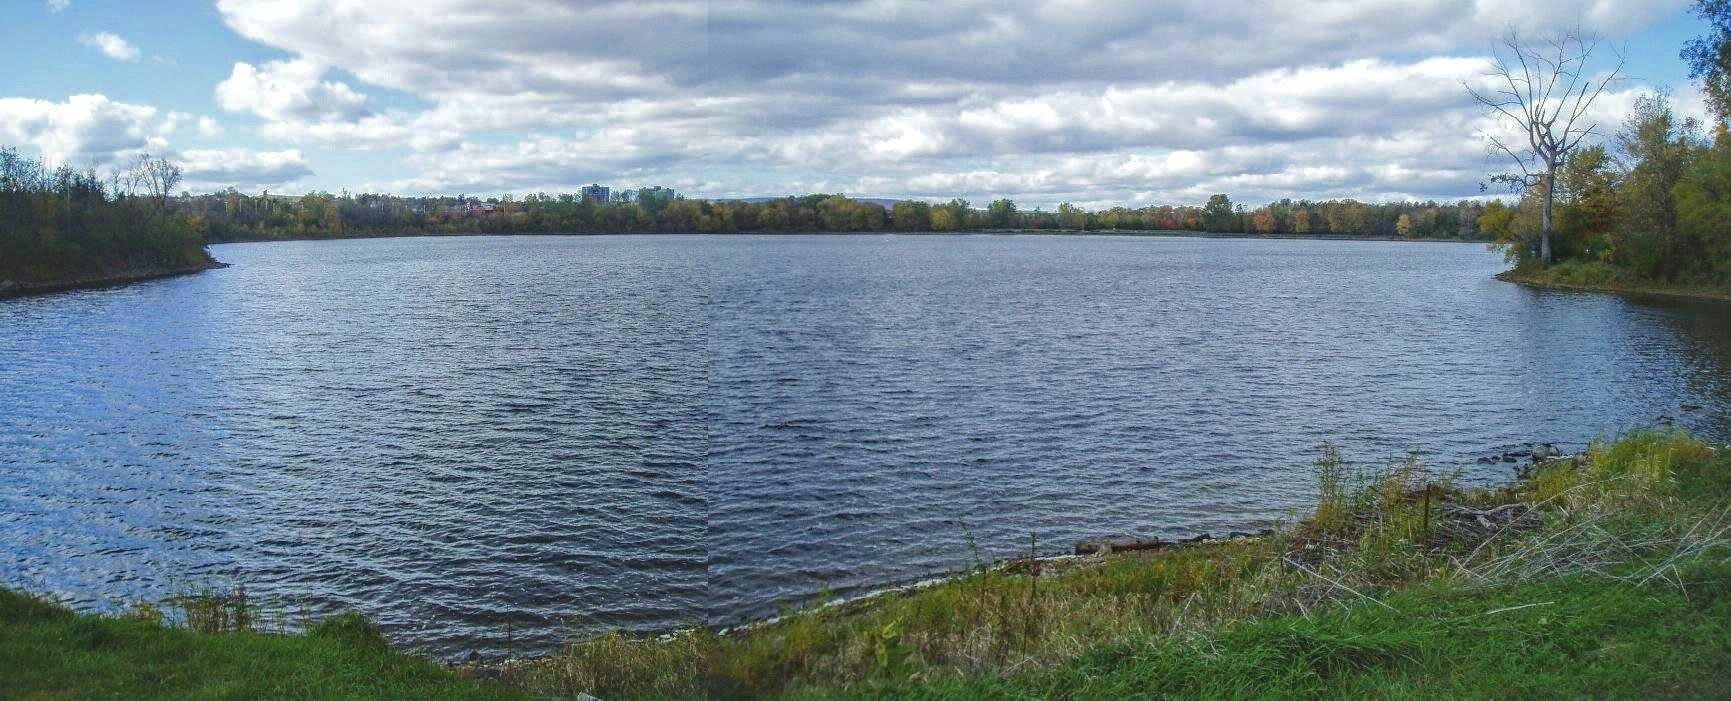 Lac-Leamy